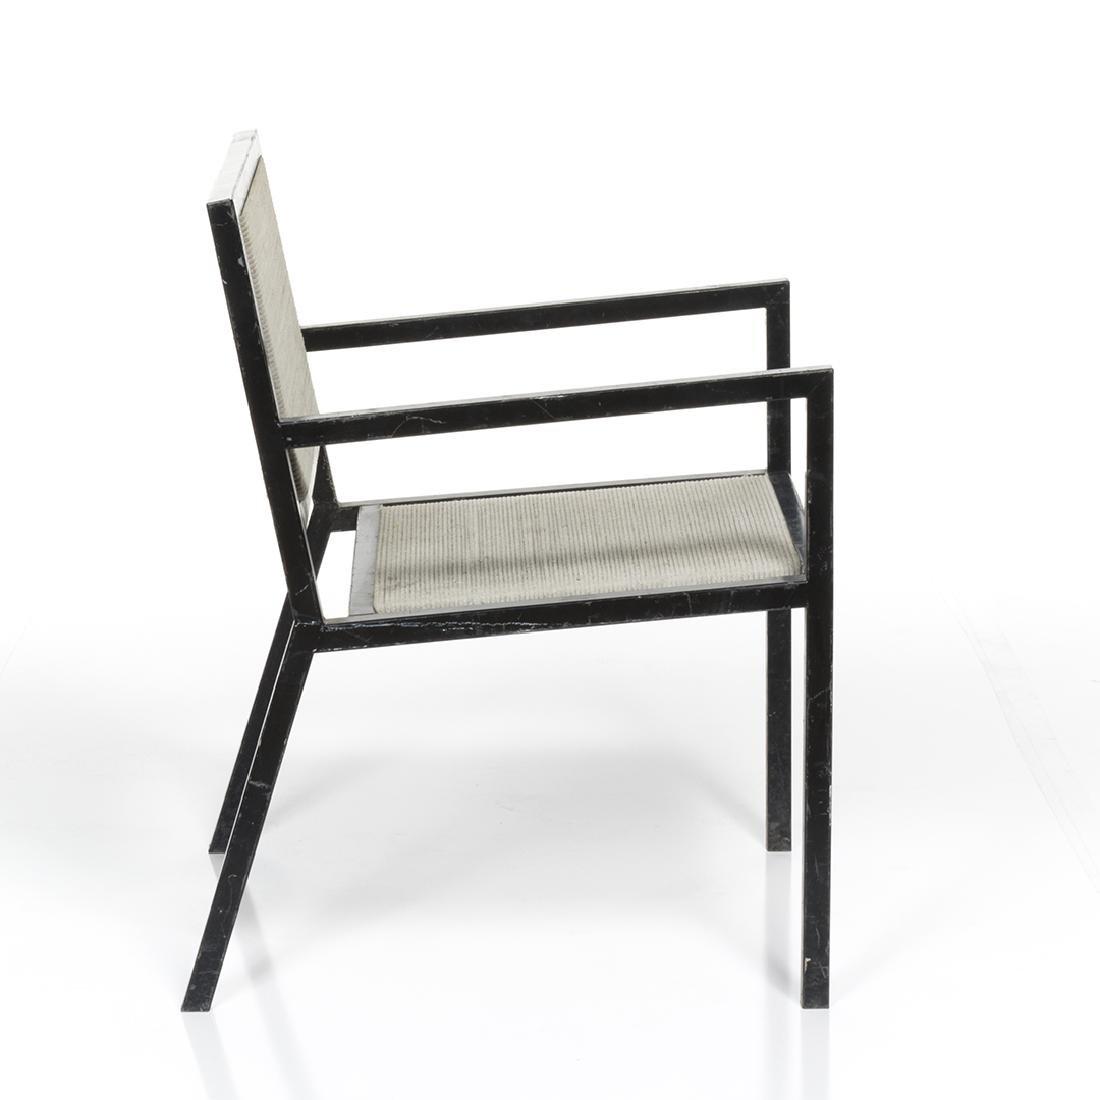 Van Keppel and Green Armchair - 3